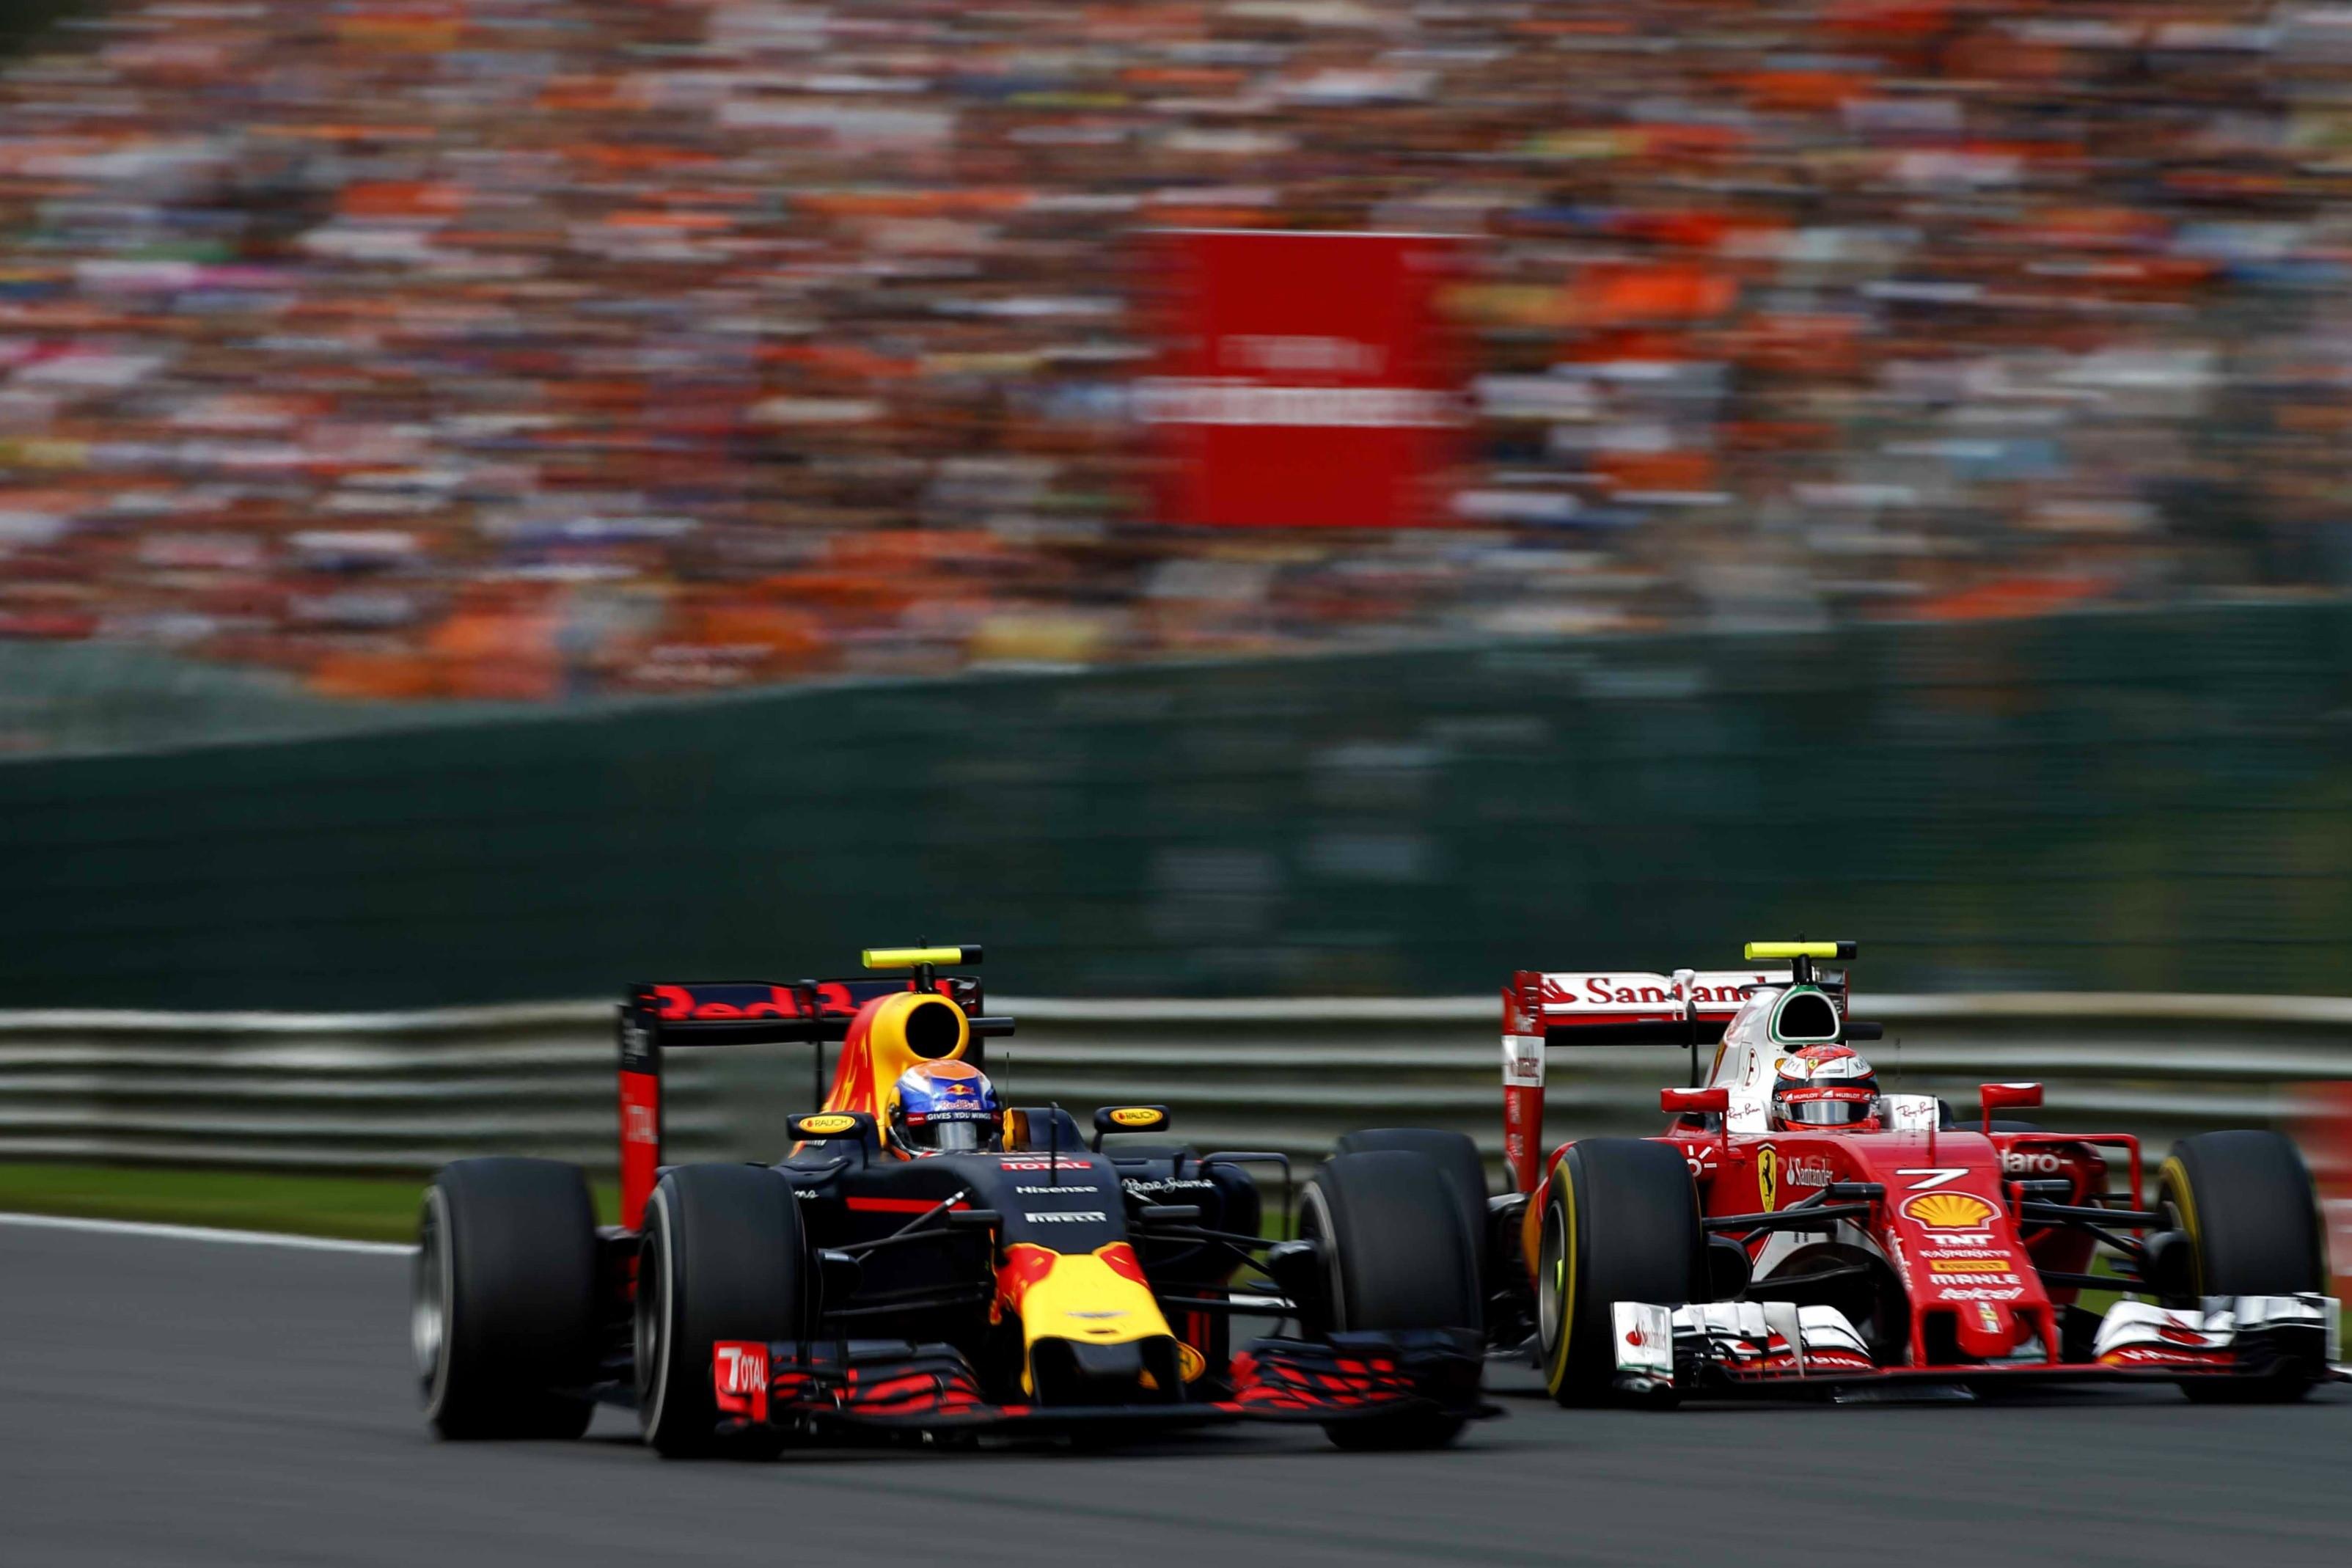 Max Verstappen (Red Bull) et Kimi Räikkönen (Ferrari) au Grand Prix de Belgique 2016